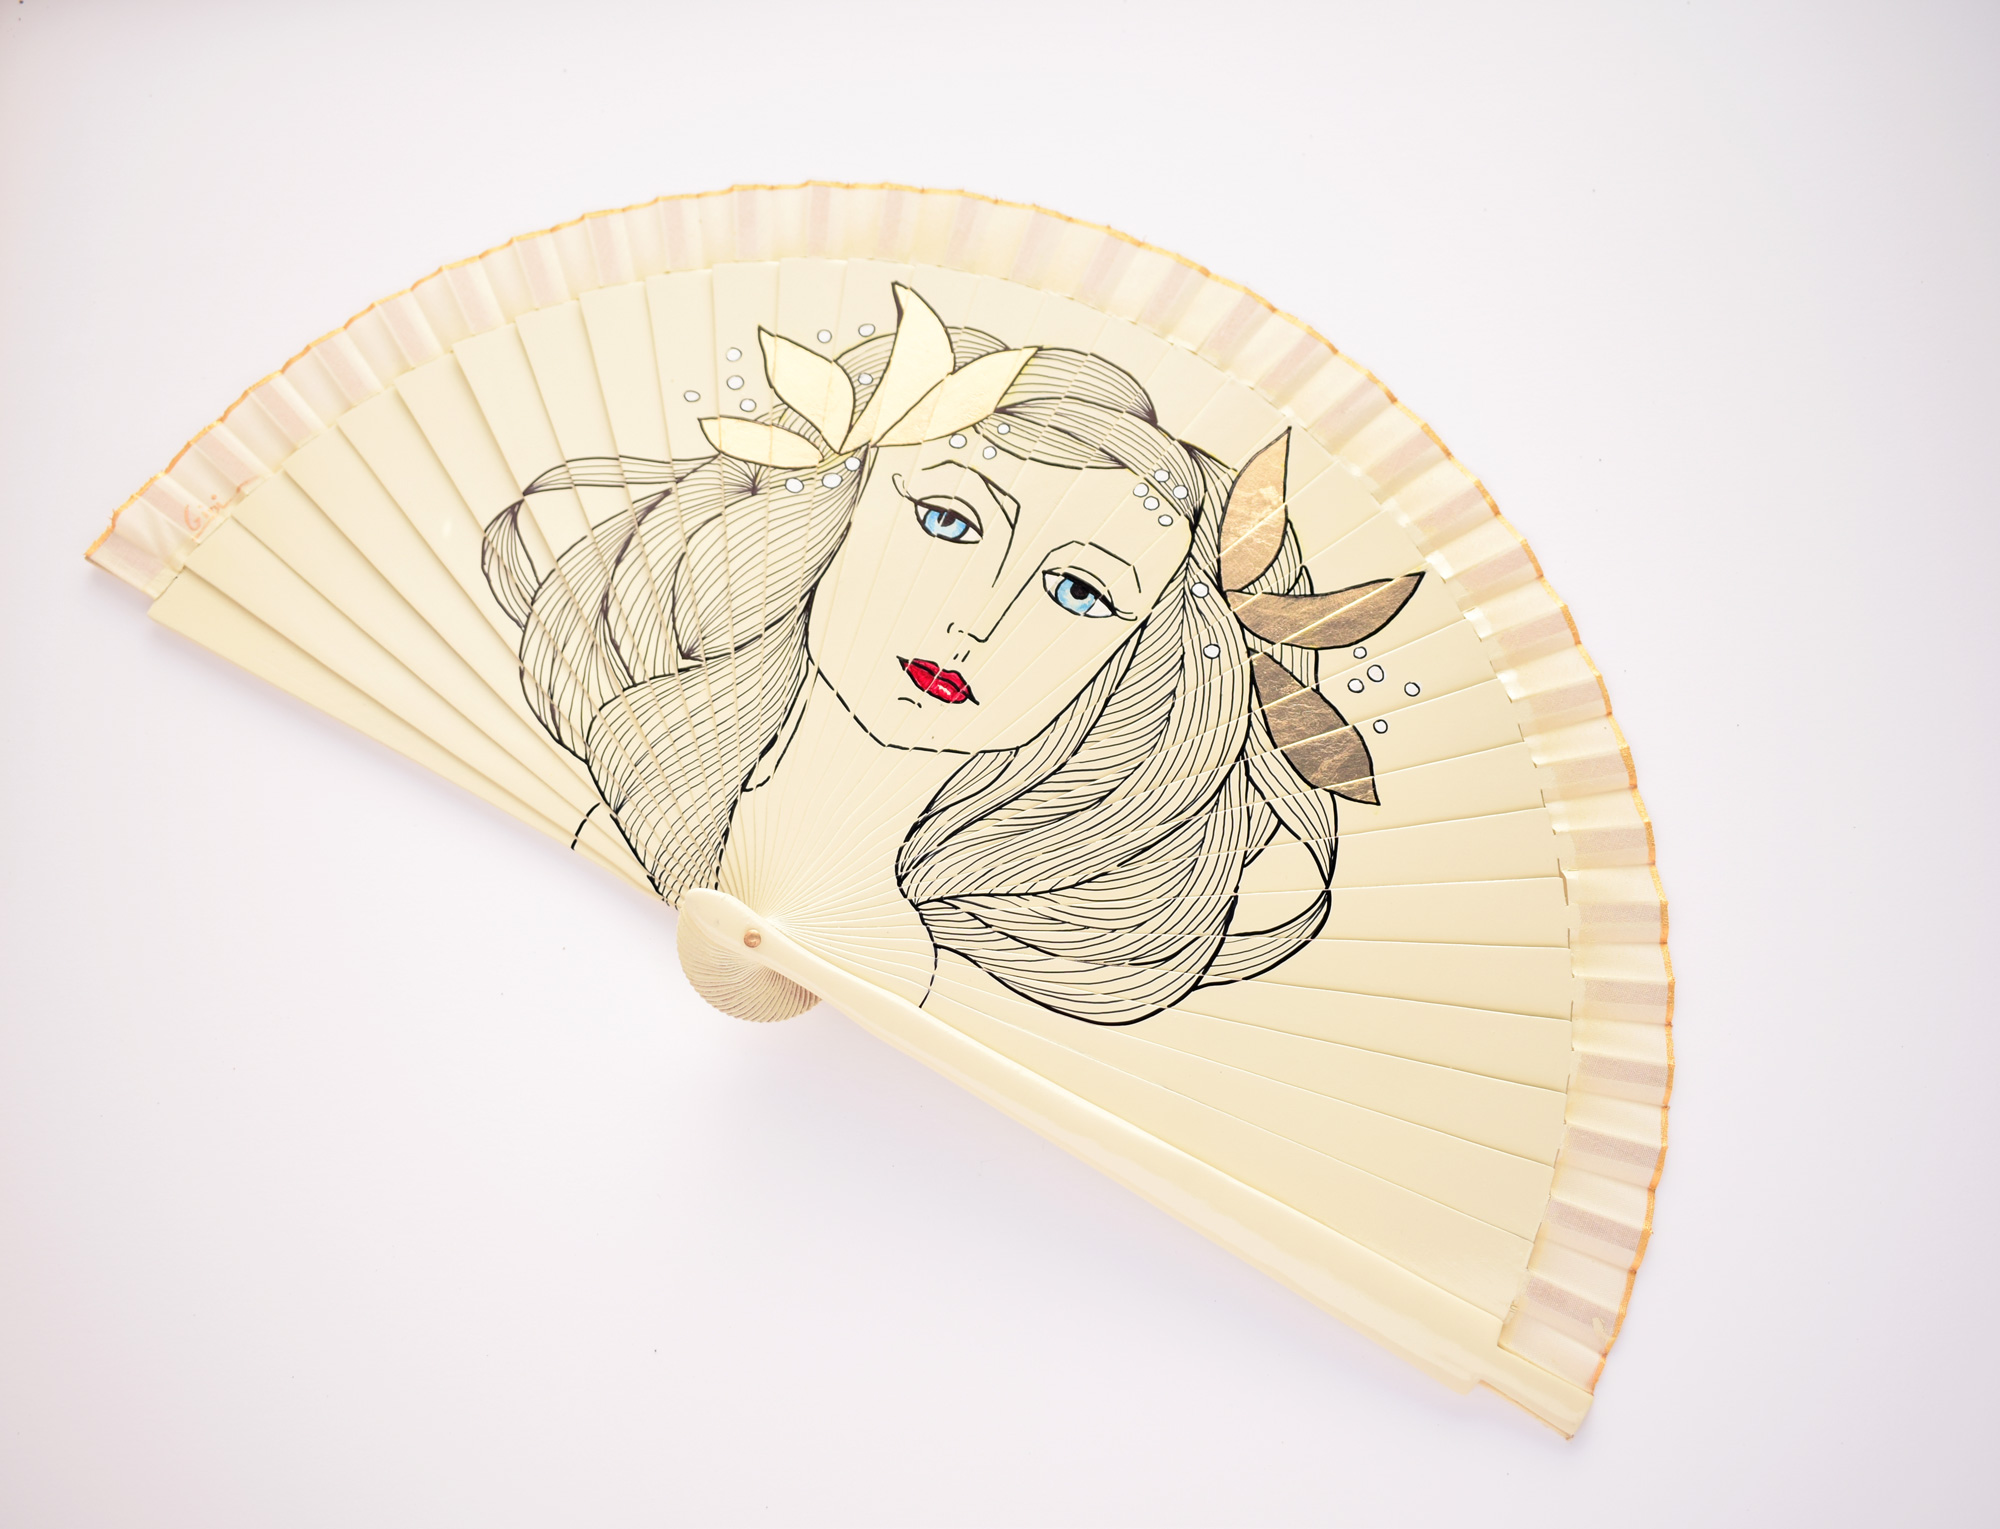 2Francoise-gillot-gigi-hand-fans